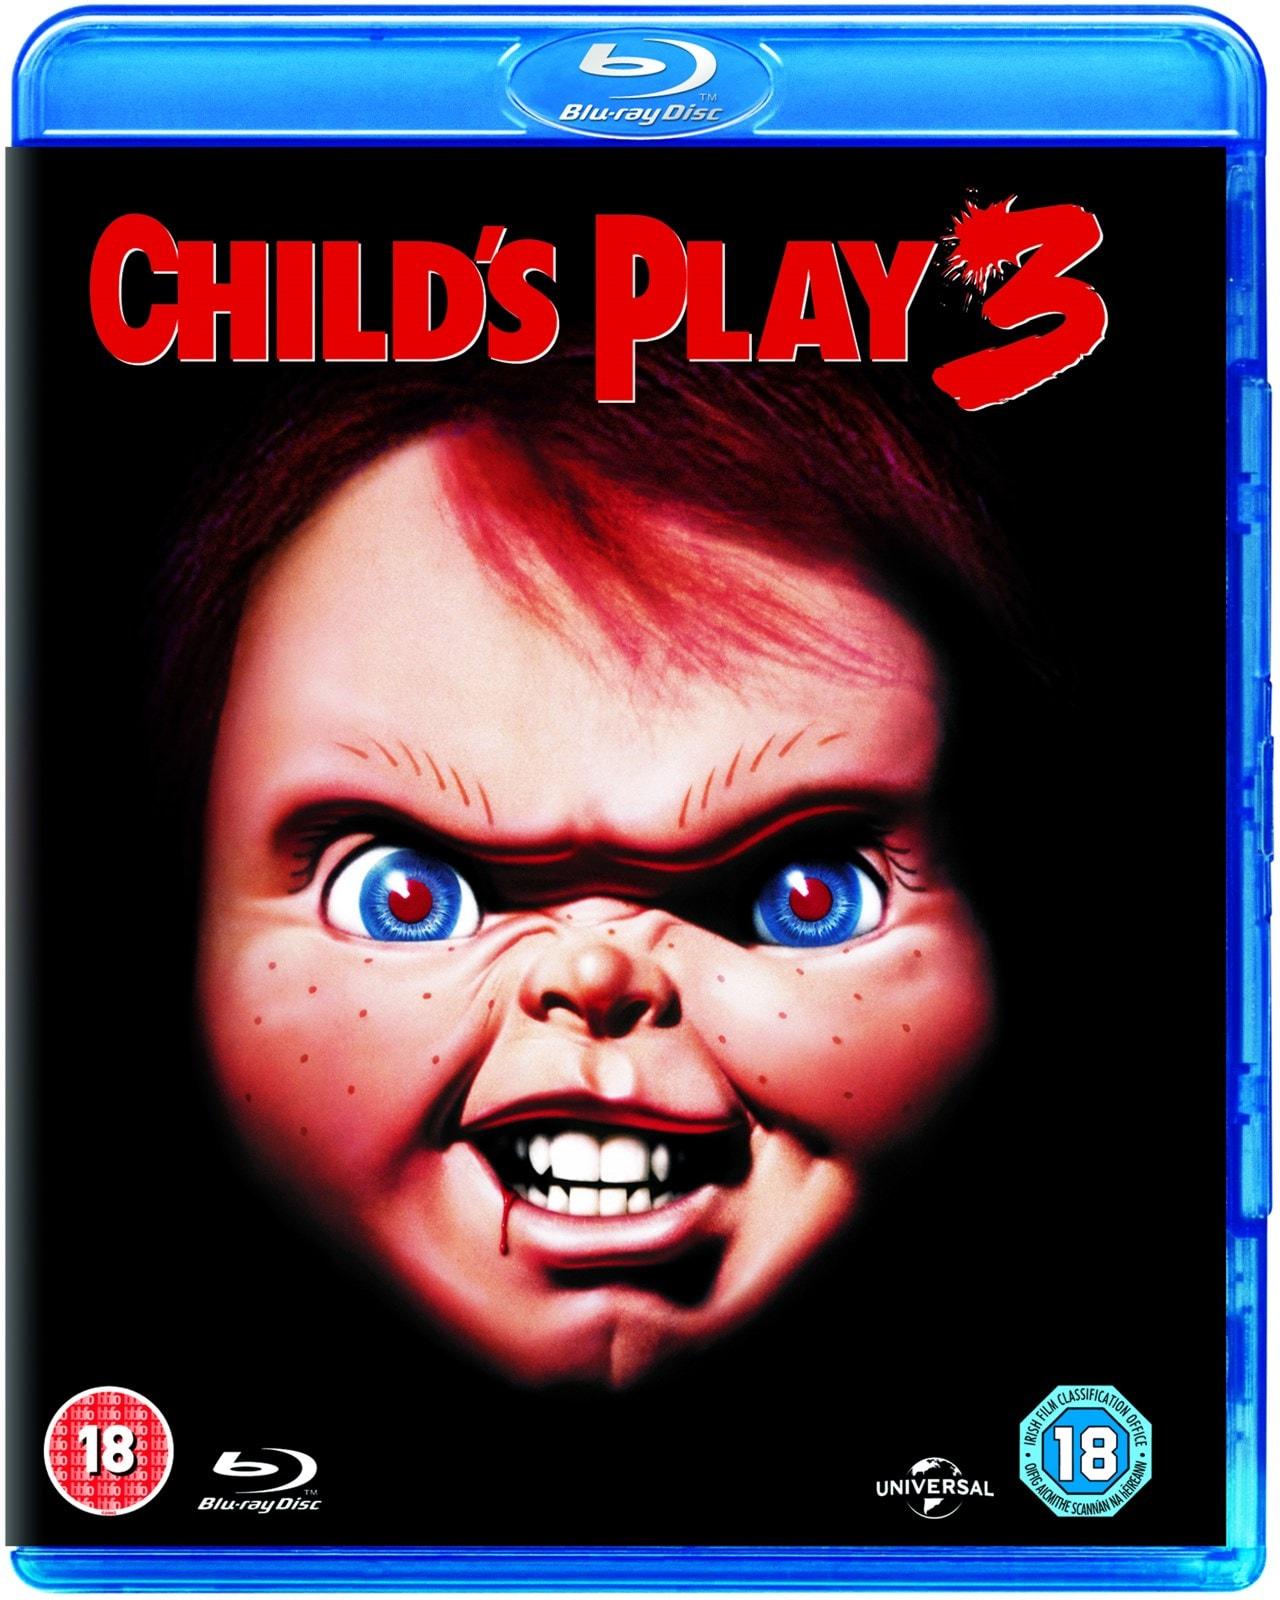 Child's Play 3 - 1